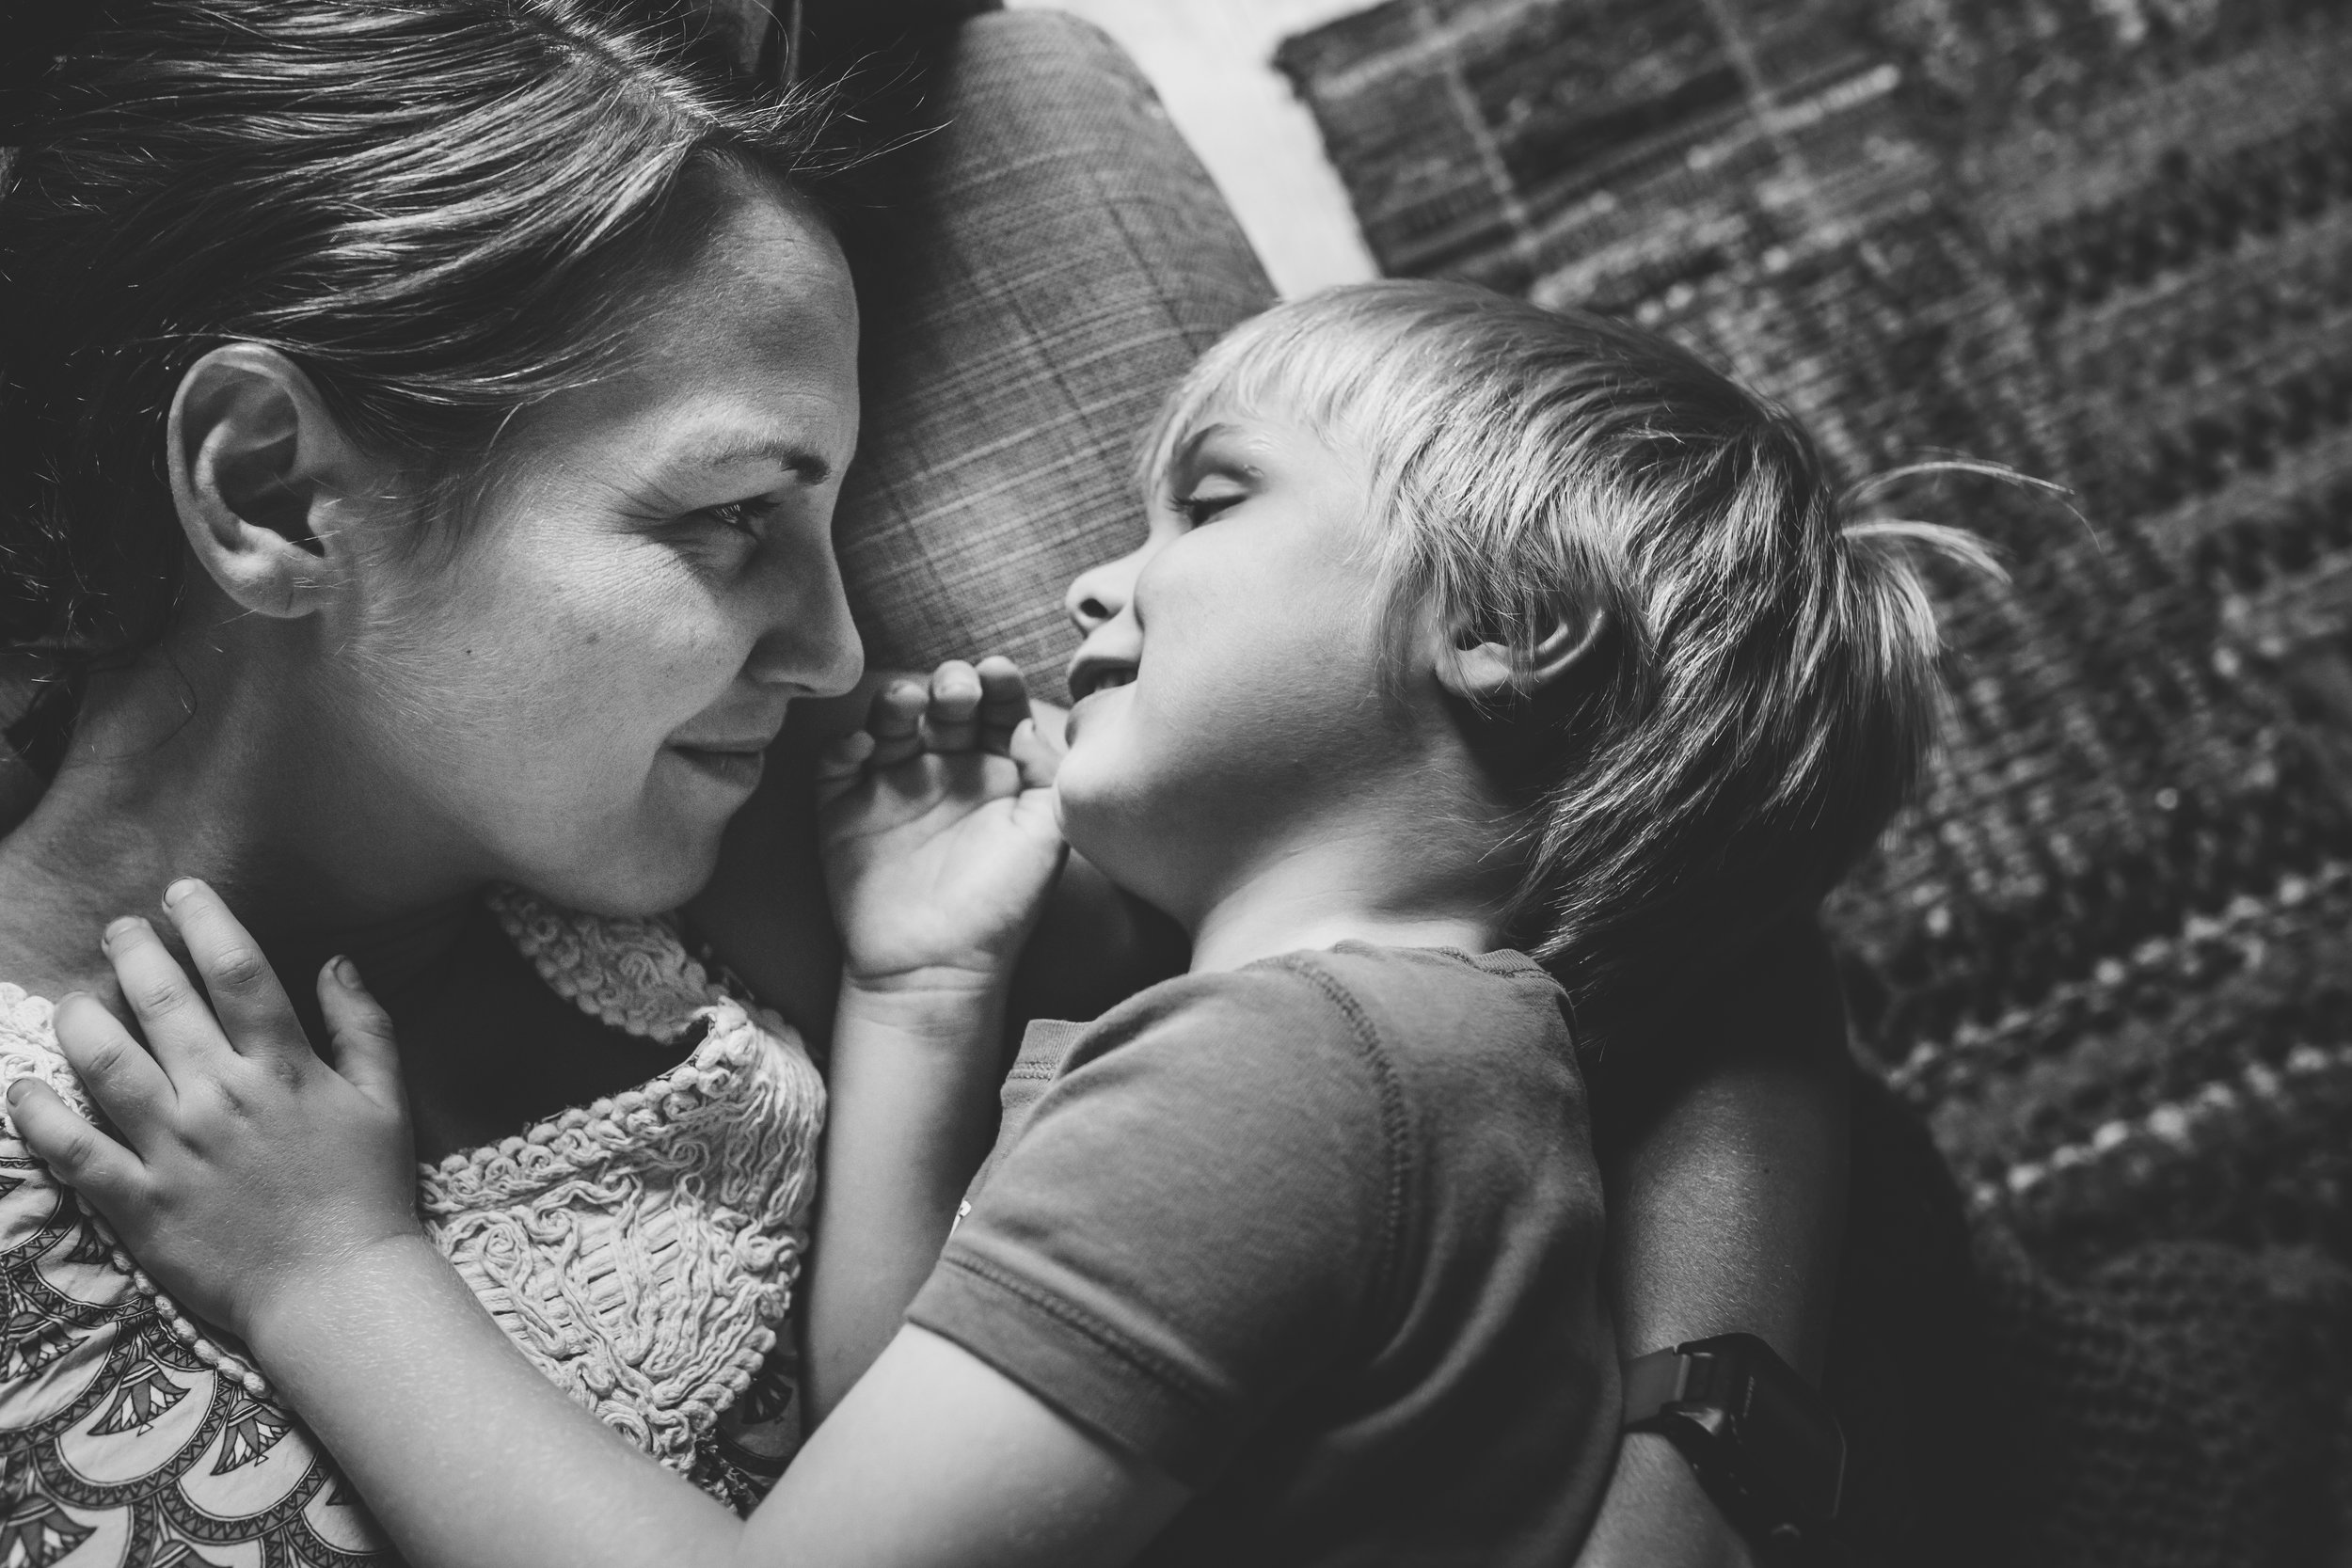 Mom gazing at little boy.